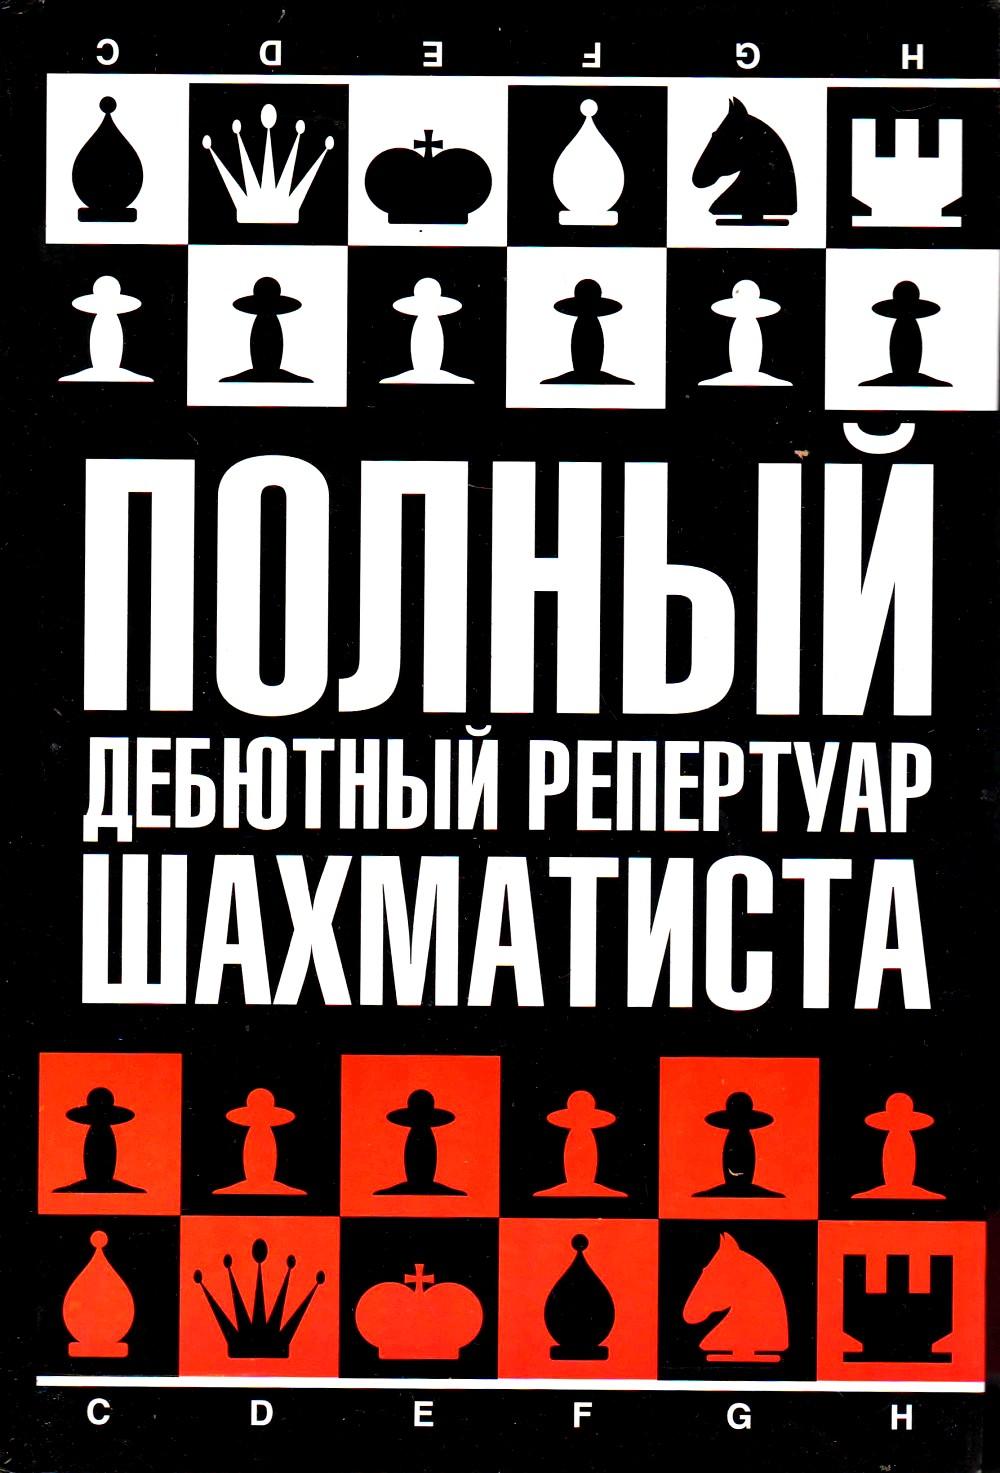 Калиниченко Н.М. Полный дебютный репертуар шахматиста паллисер р атака торре дебютный репертуар за белых